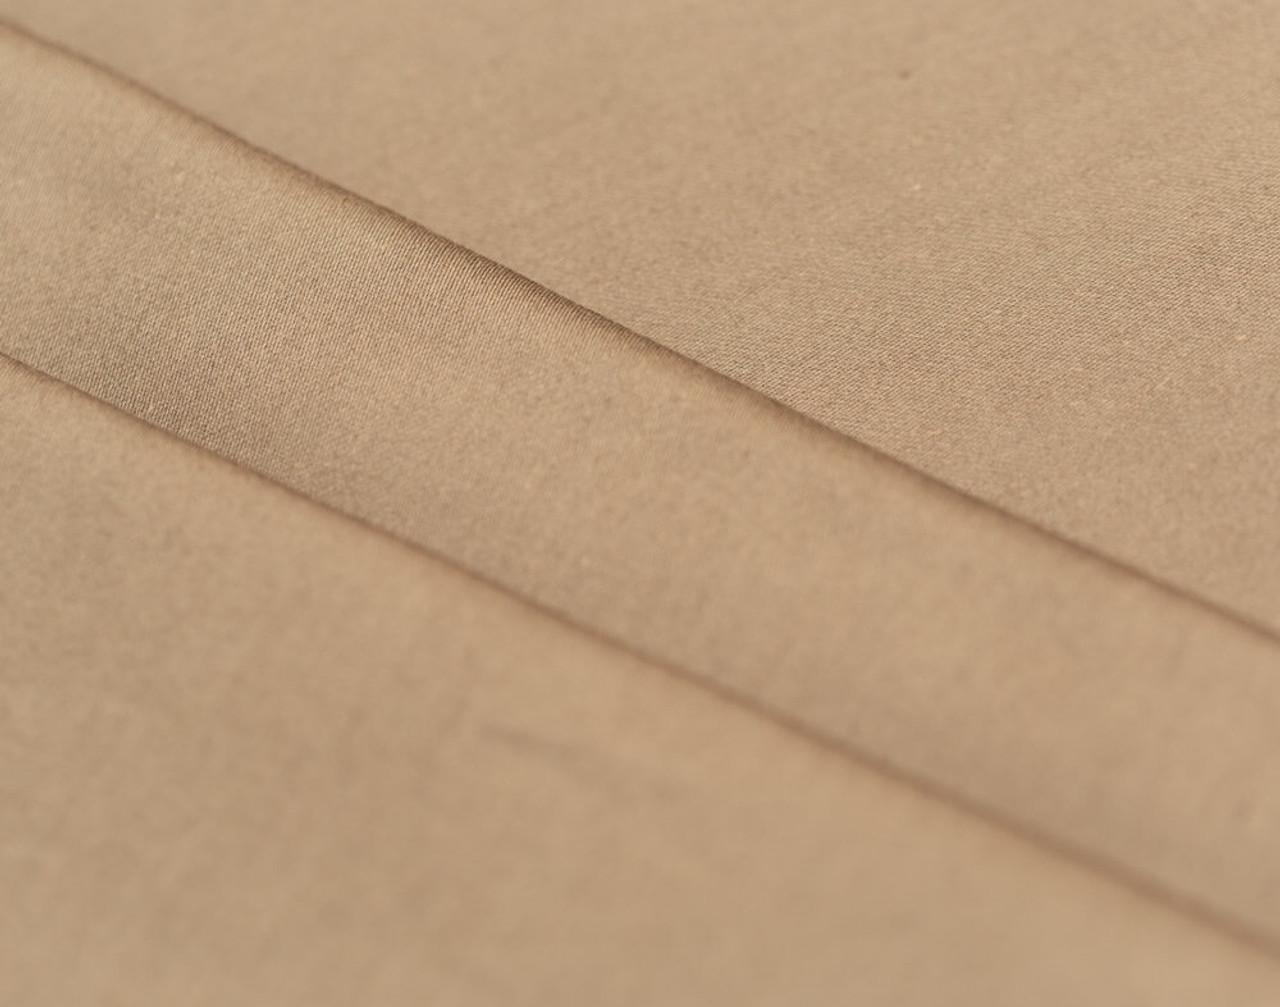 300TC Cotton Sateen Sheet Set - Khaki